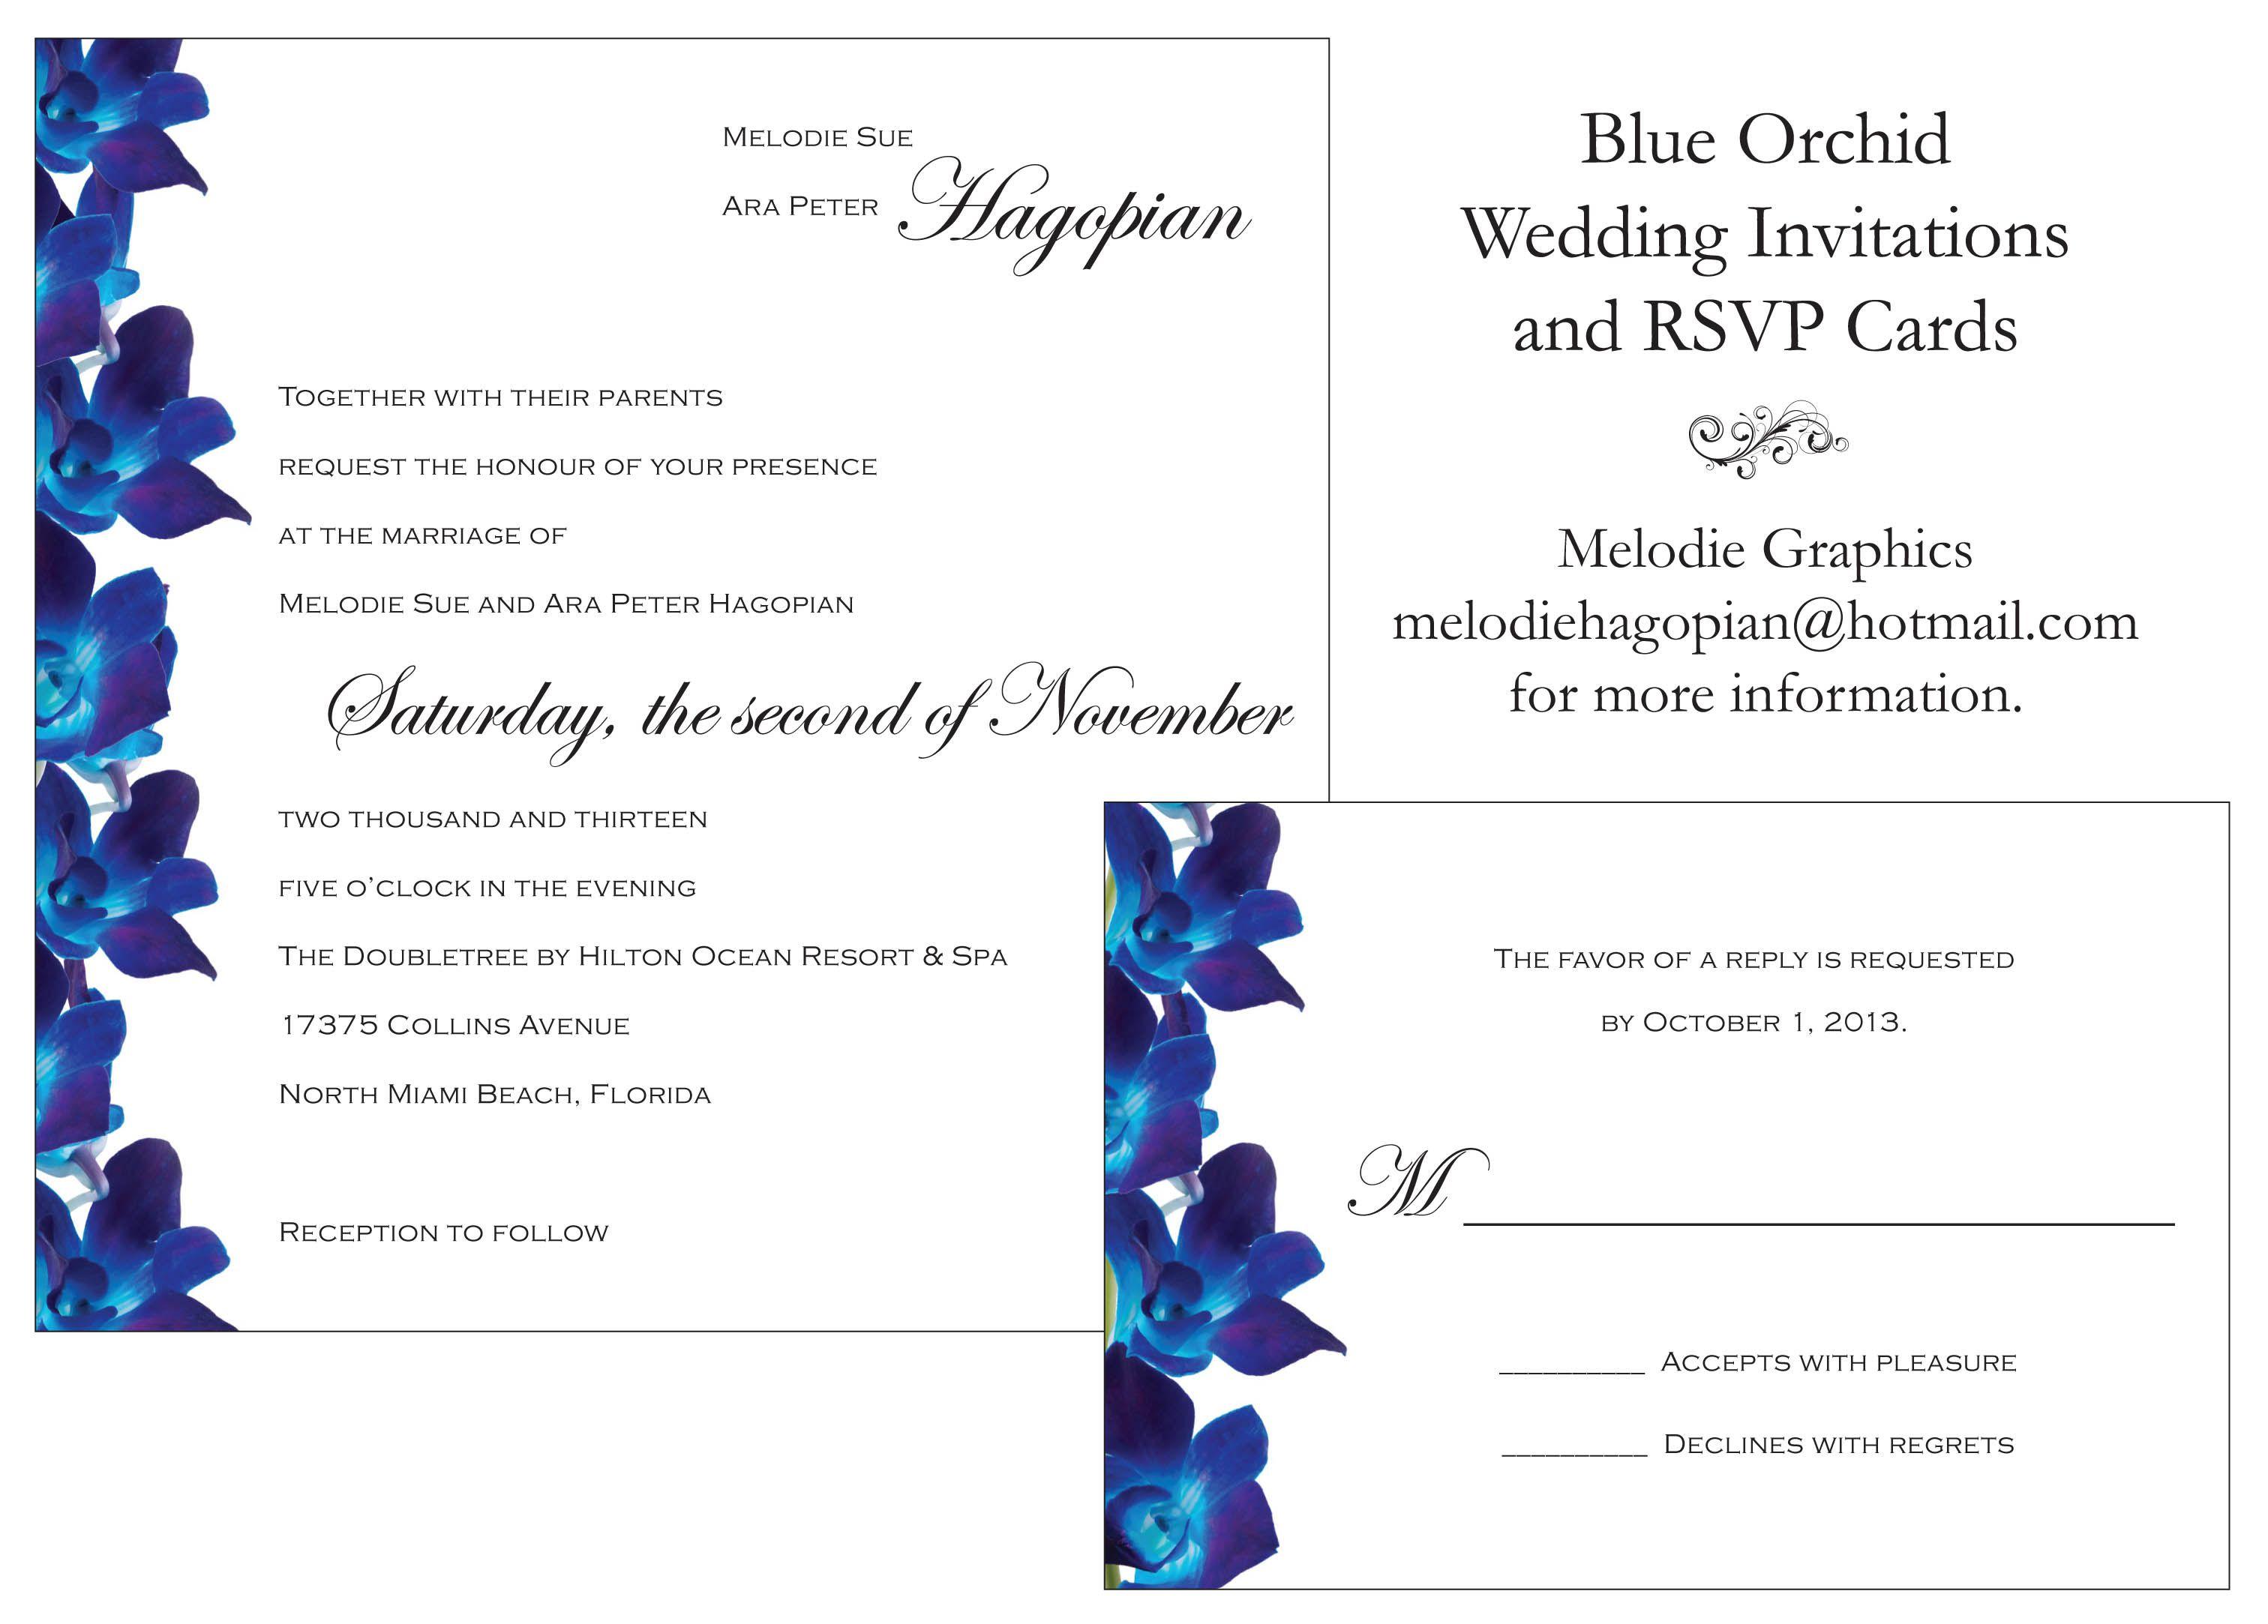 blue orchid wedding invitations amp rsvp cards wedding